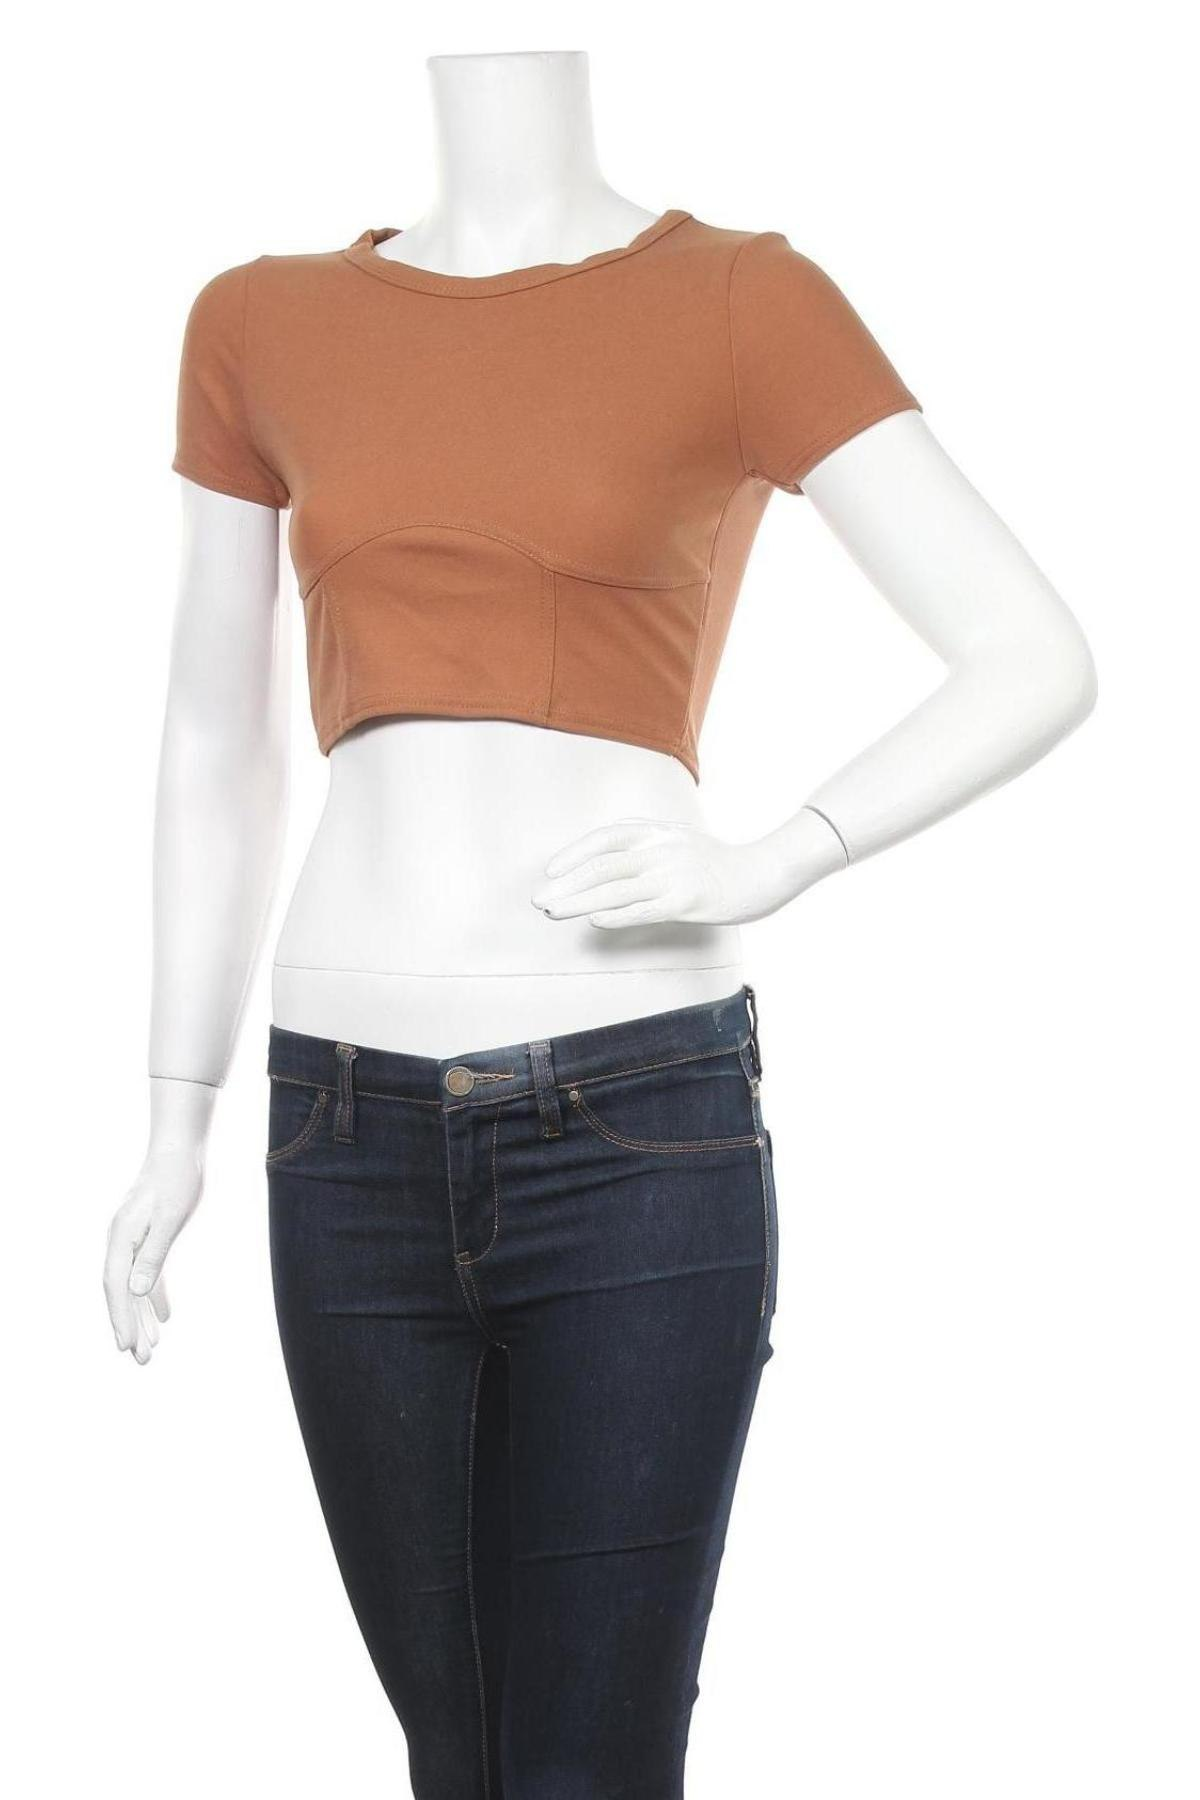 Дамска блуза Stylewise, Размер S, Цвят Кафяв, 95% полиестер, 5% еластан, Цена 14,40лв.